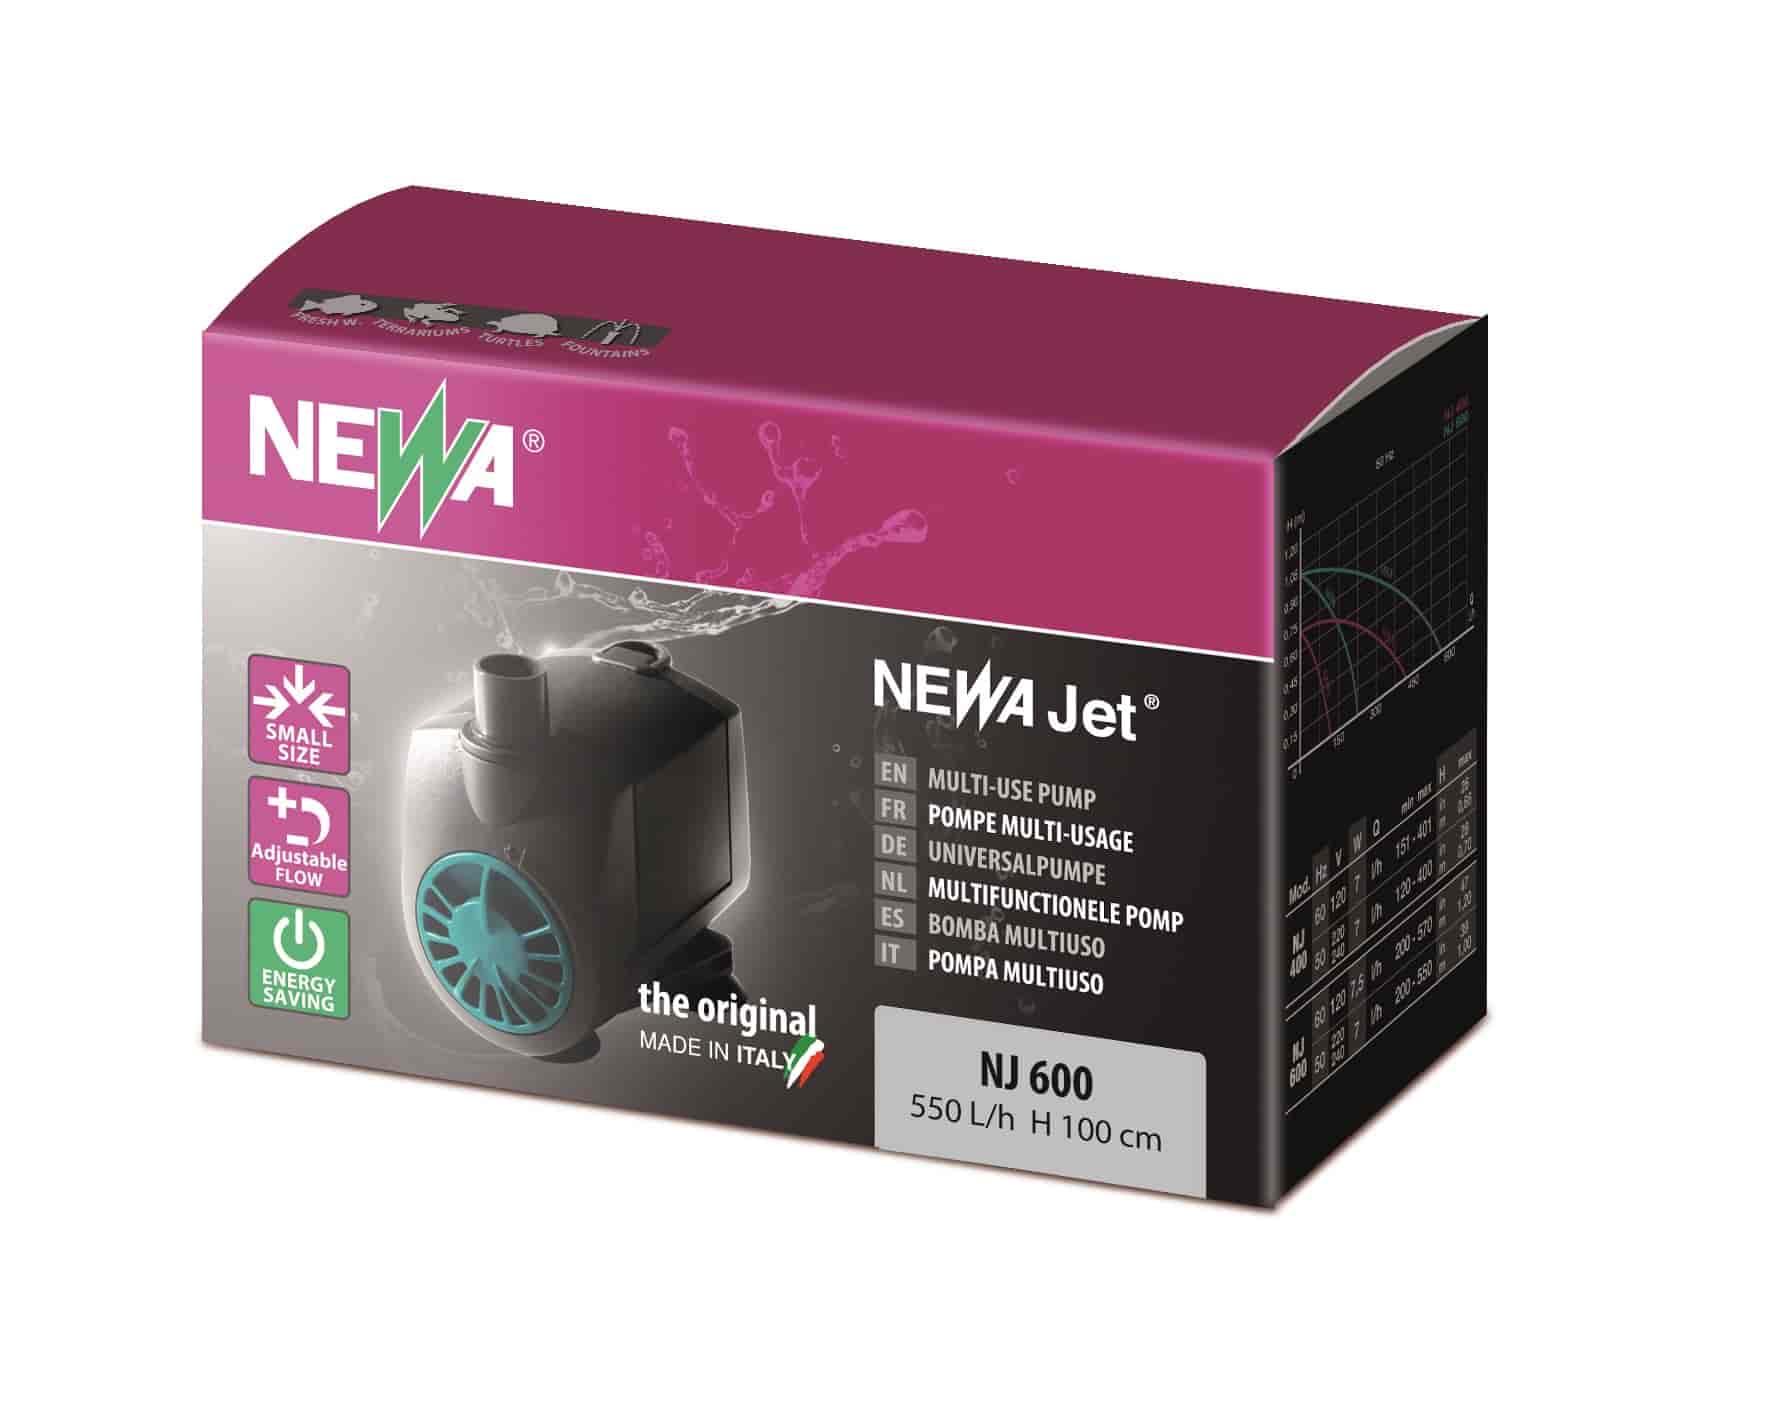 pompe-aquarium-newa-NJ-600-newjet-min